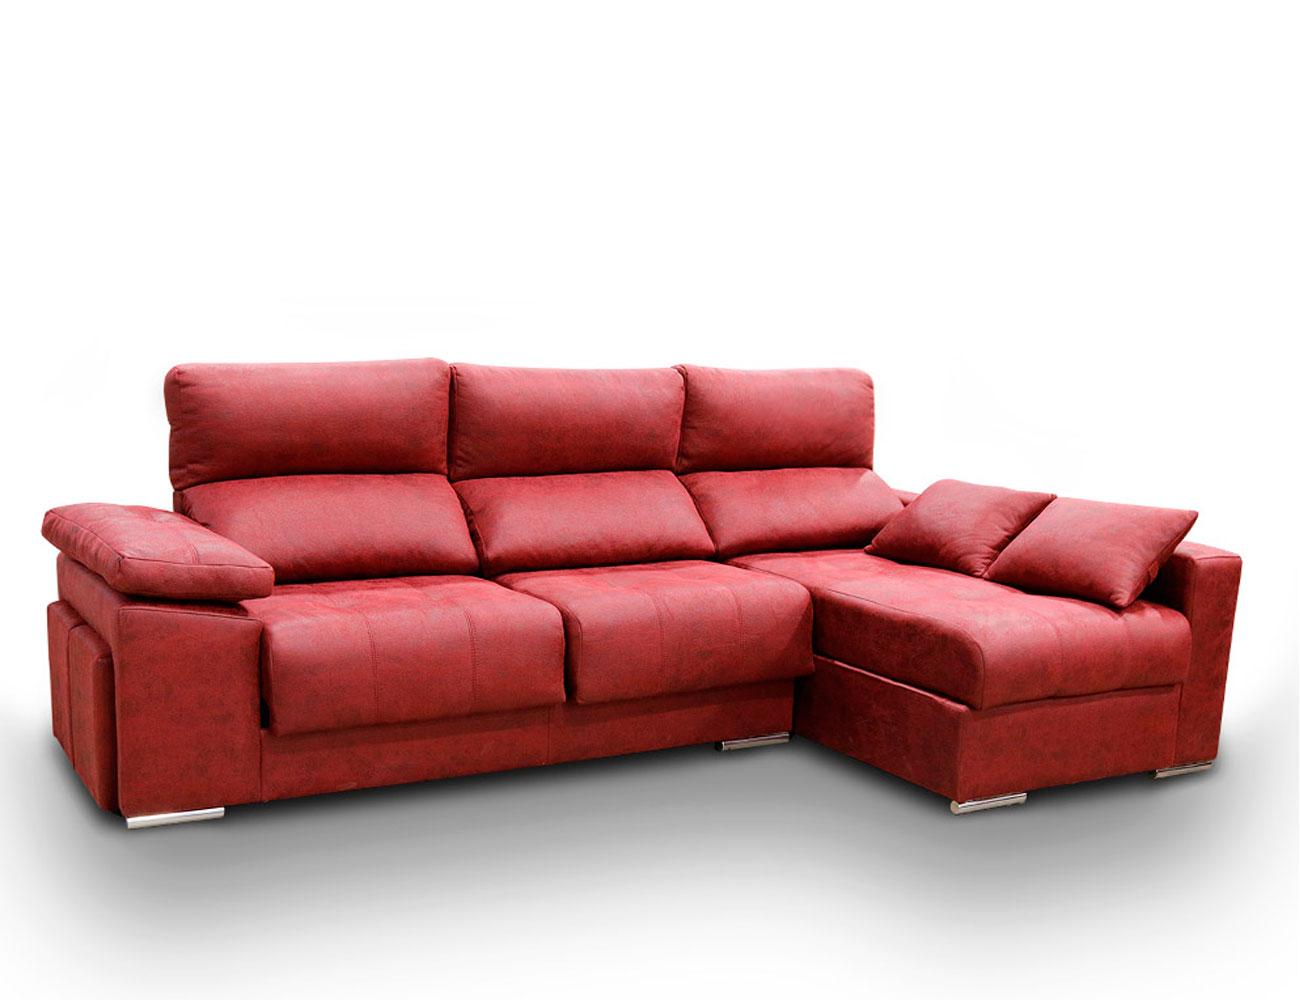 Sofa chaiselongue anti manchas rojo granate20